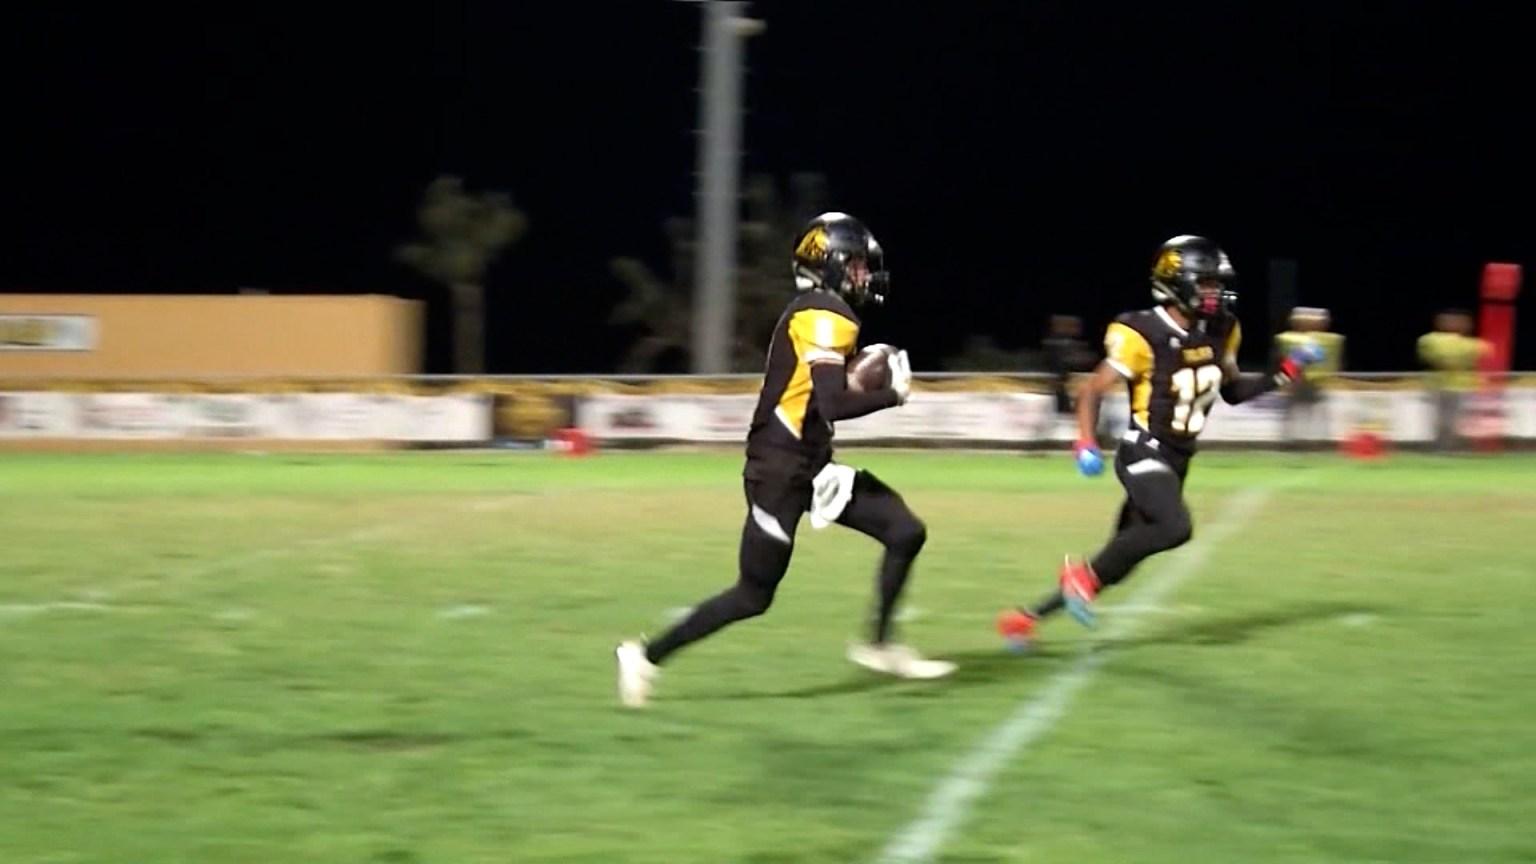 Yucca Valley High School Football Program in Search of Head Coach